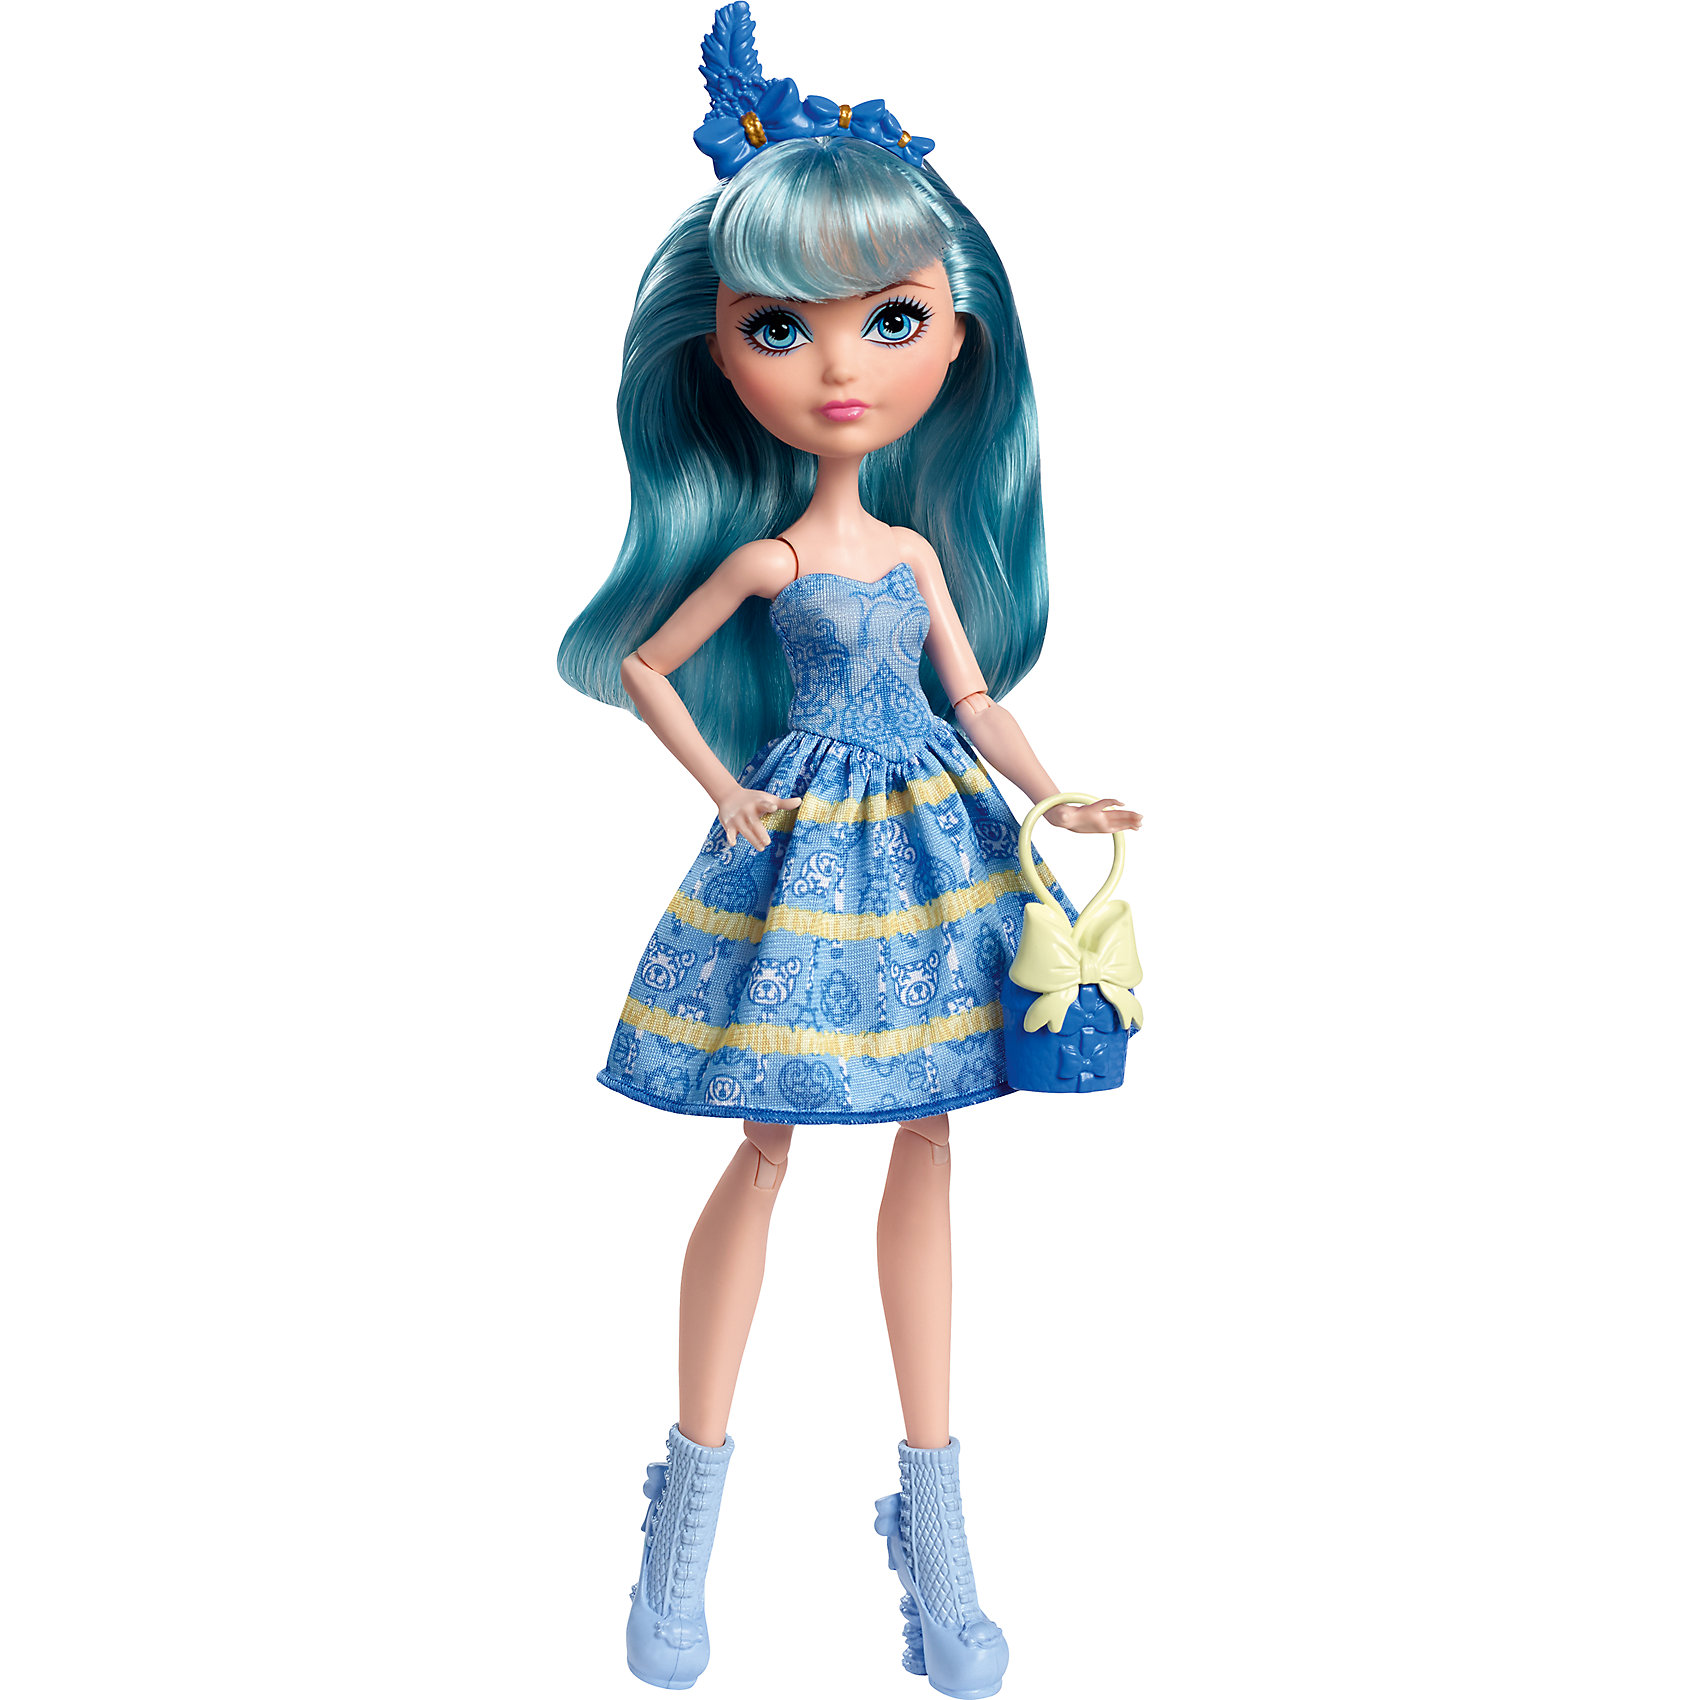 Mattel Кукла Блонди Локс из серии Именинный бал, Ever After